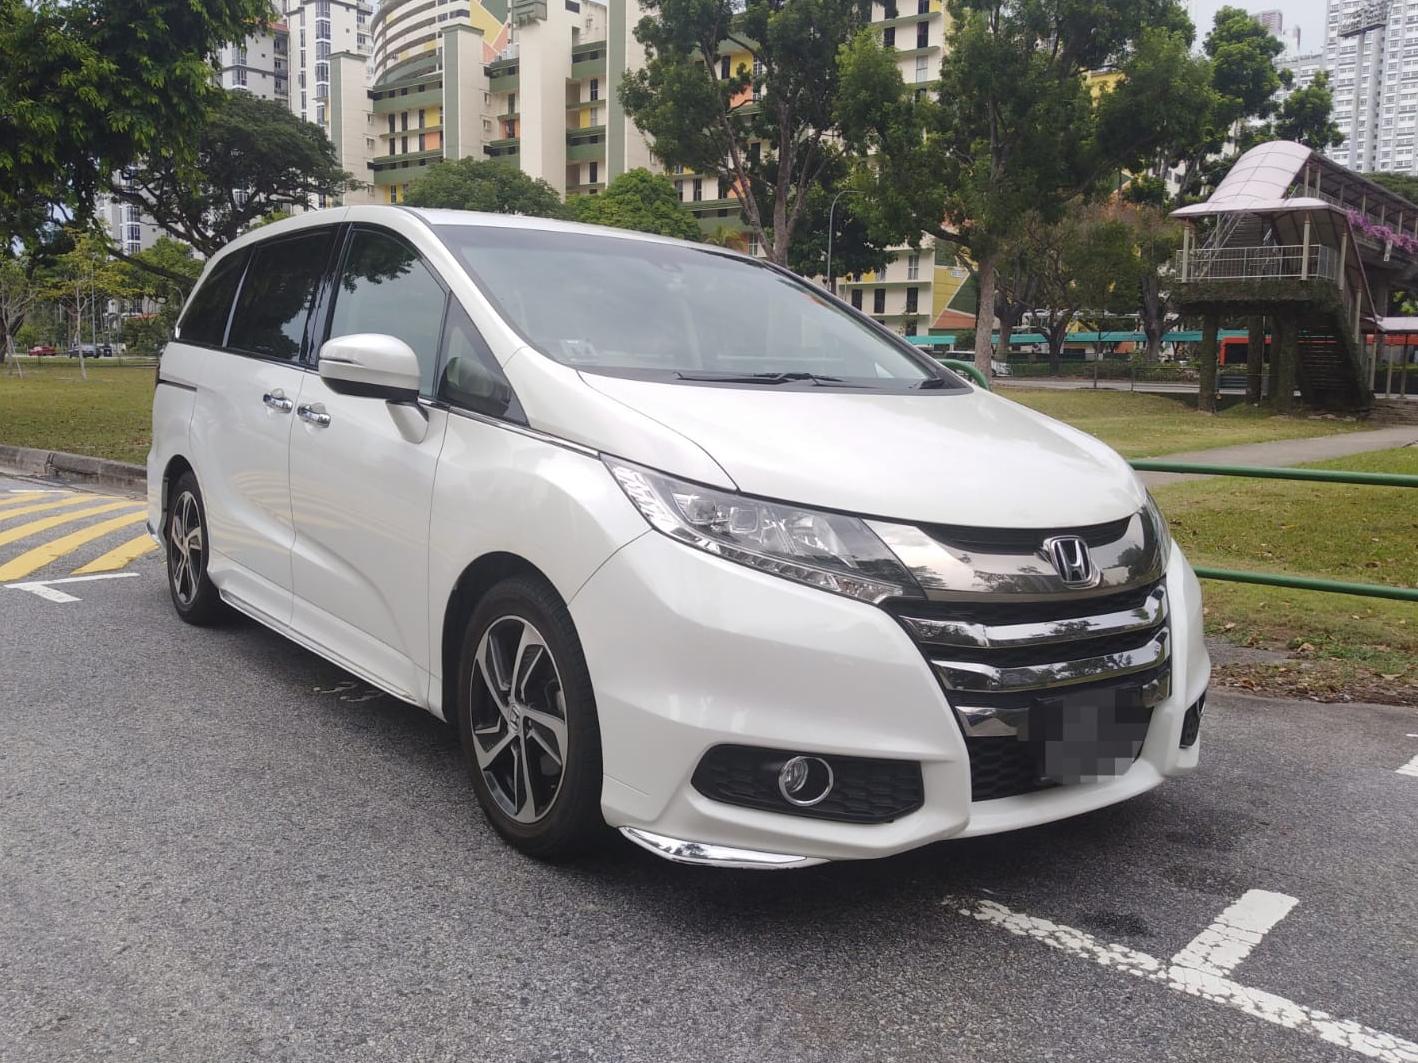 Honda Odyssey (For Lease)